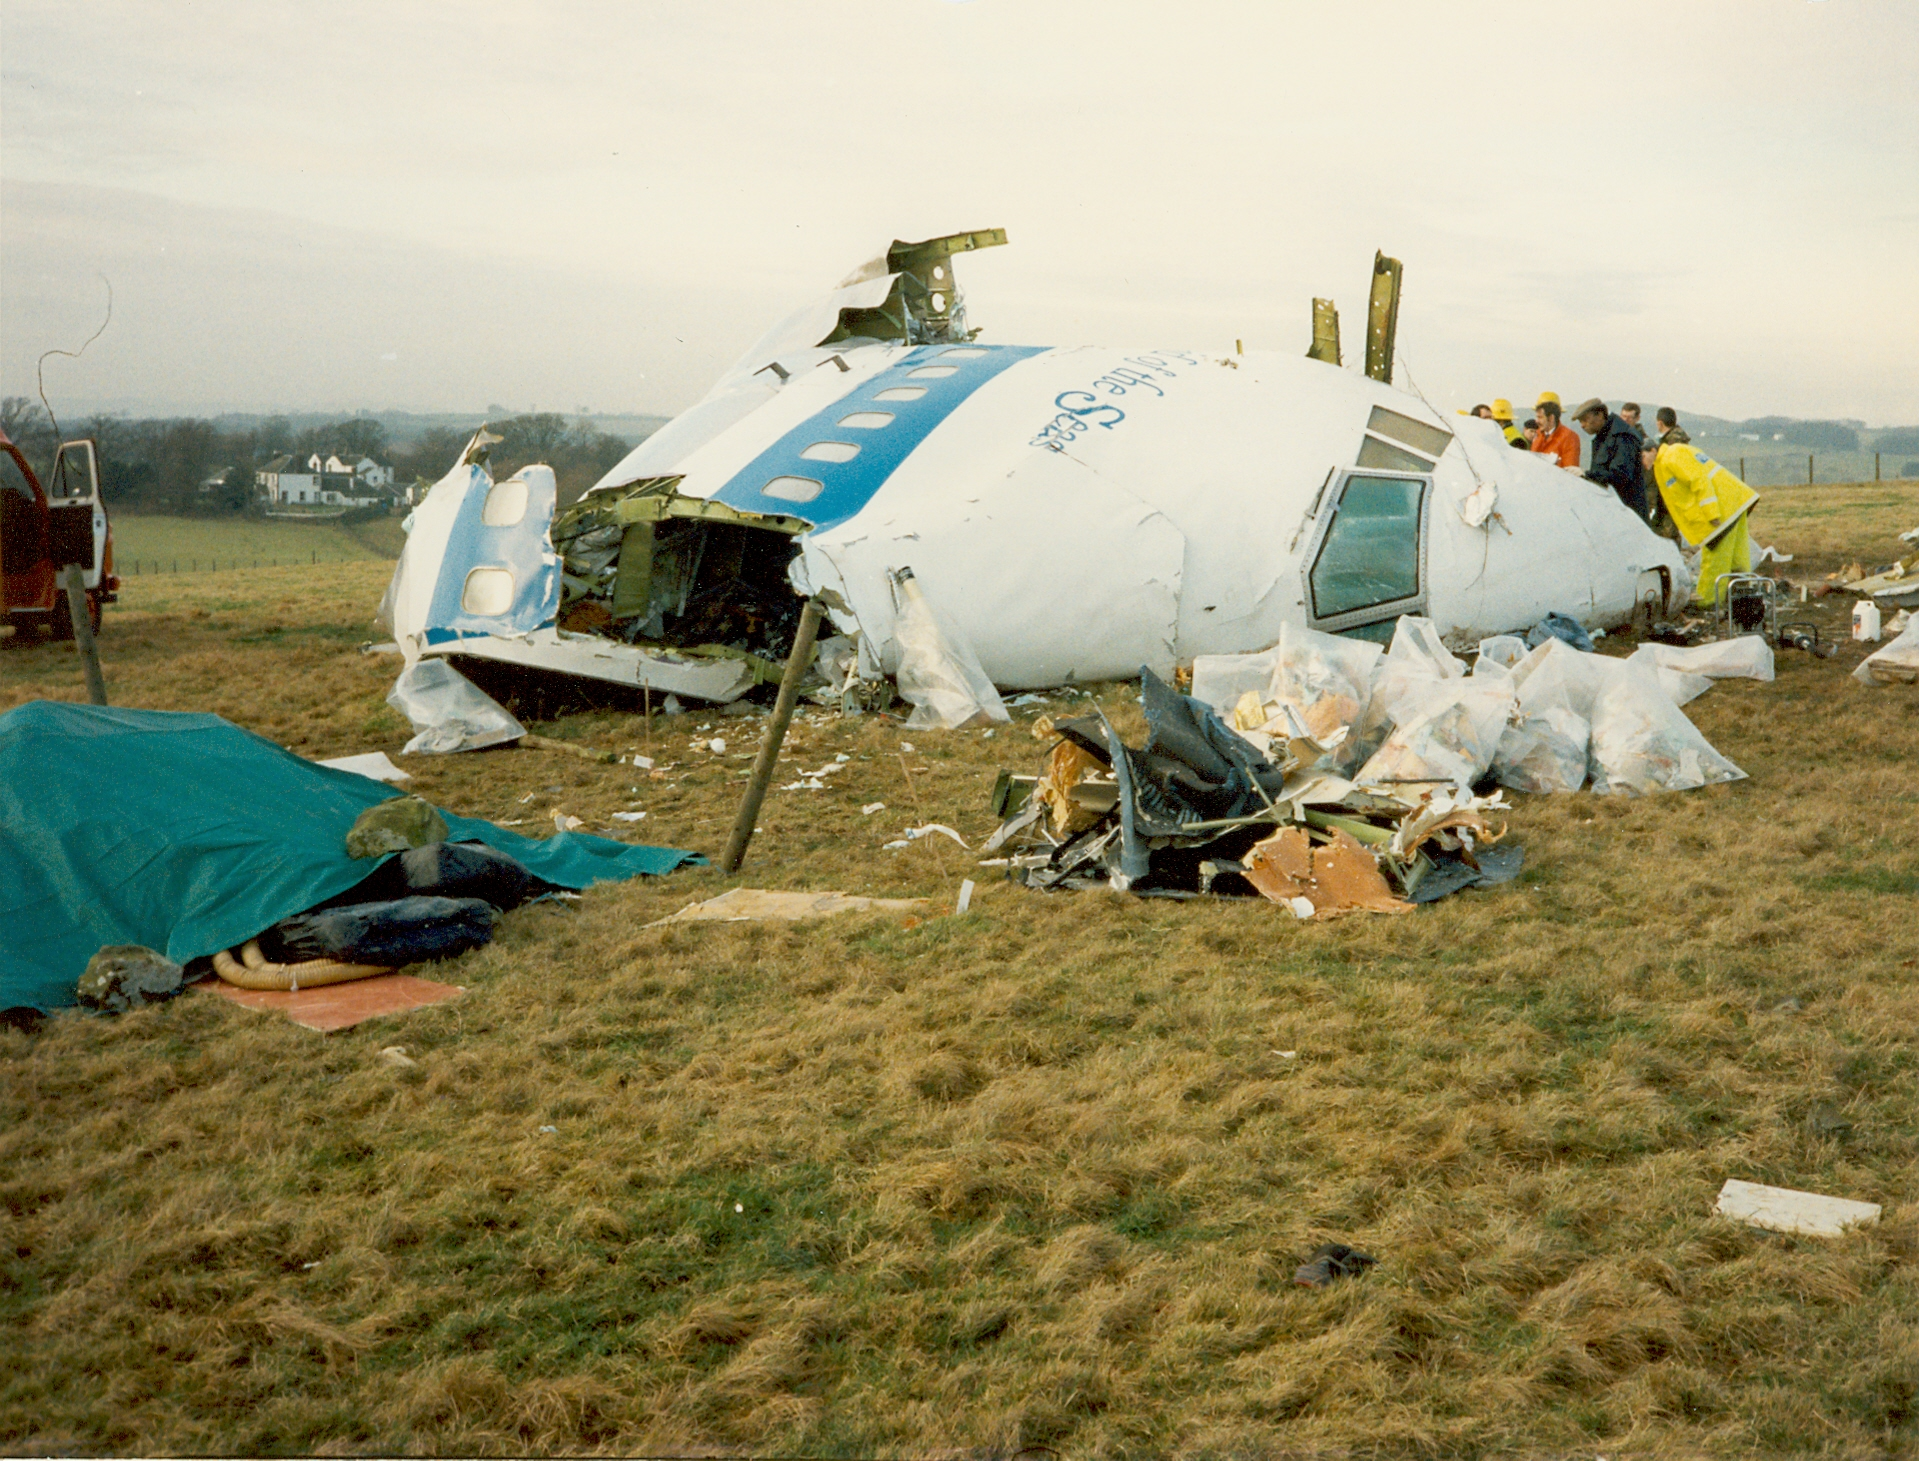 pan am flight 103 bombing Lockerbie plane and victim on december 21, 1988, pan american flight 103 flying  from london heathrow to jfk airport in new york exploded over lockerbie,.